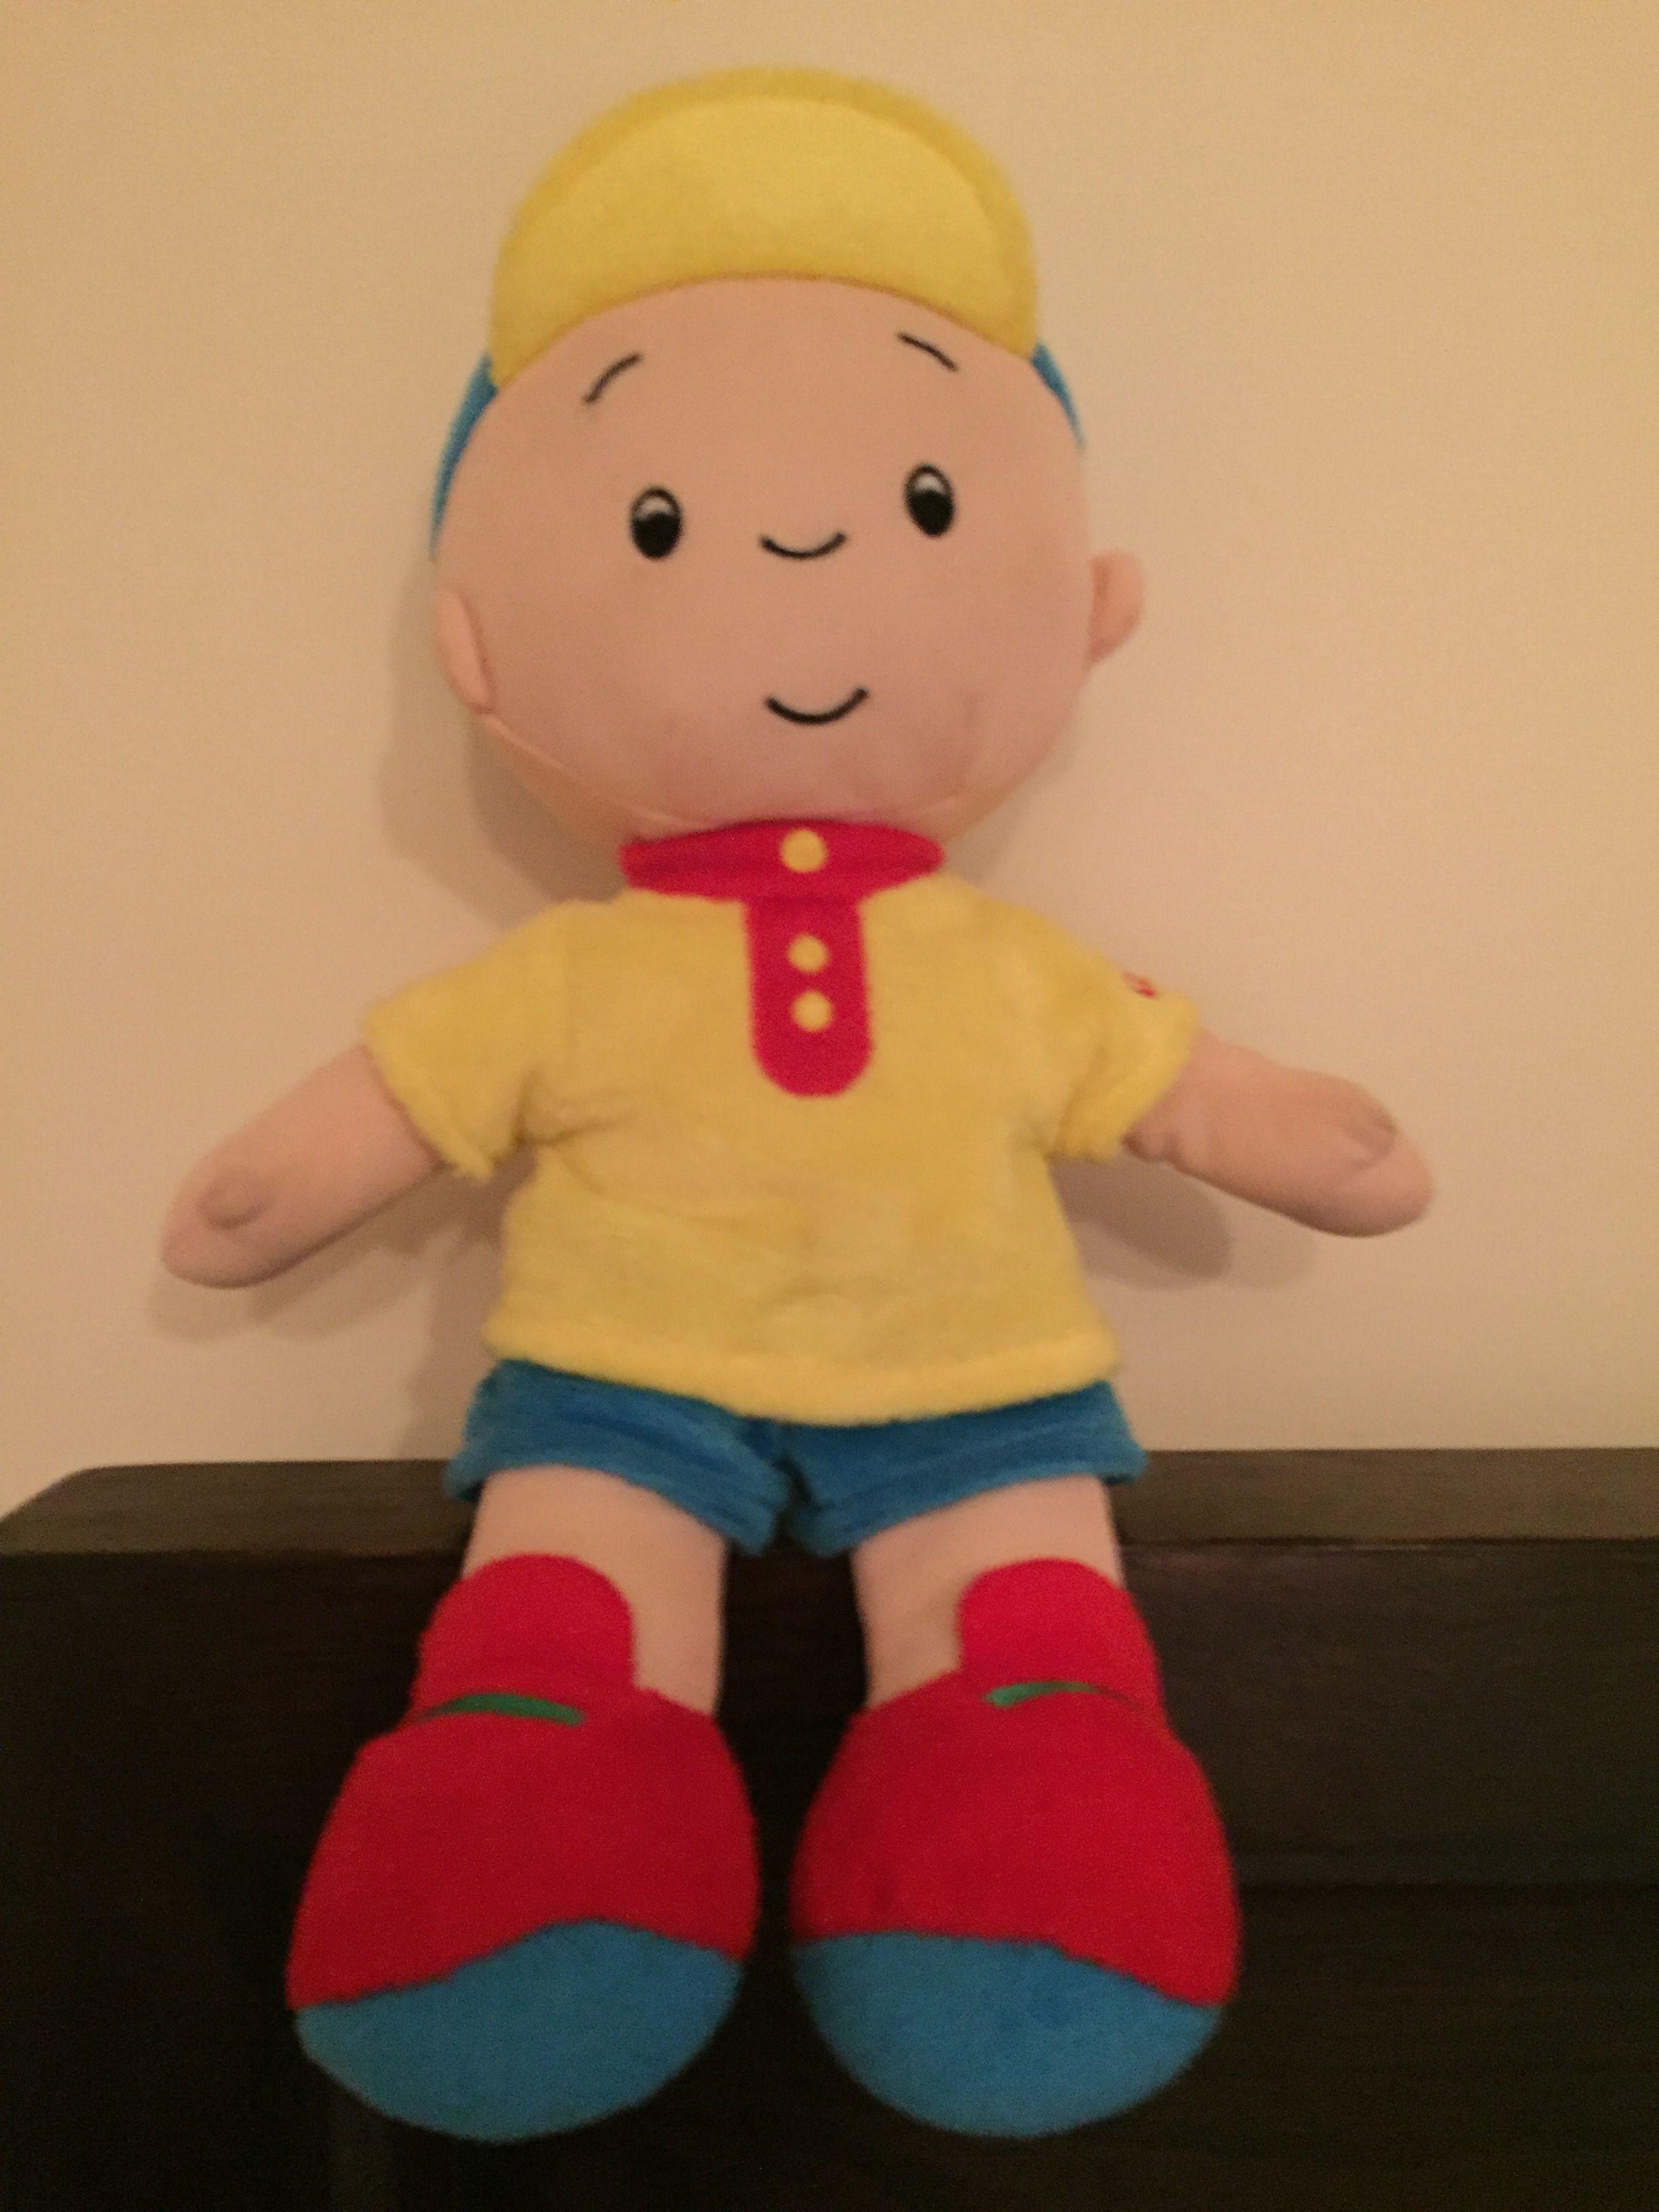 Free shipping 12inch Caillou Plush Soft Stuffed Cartoon Figure Doll Kids Toys